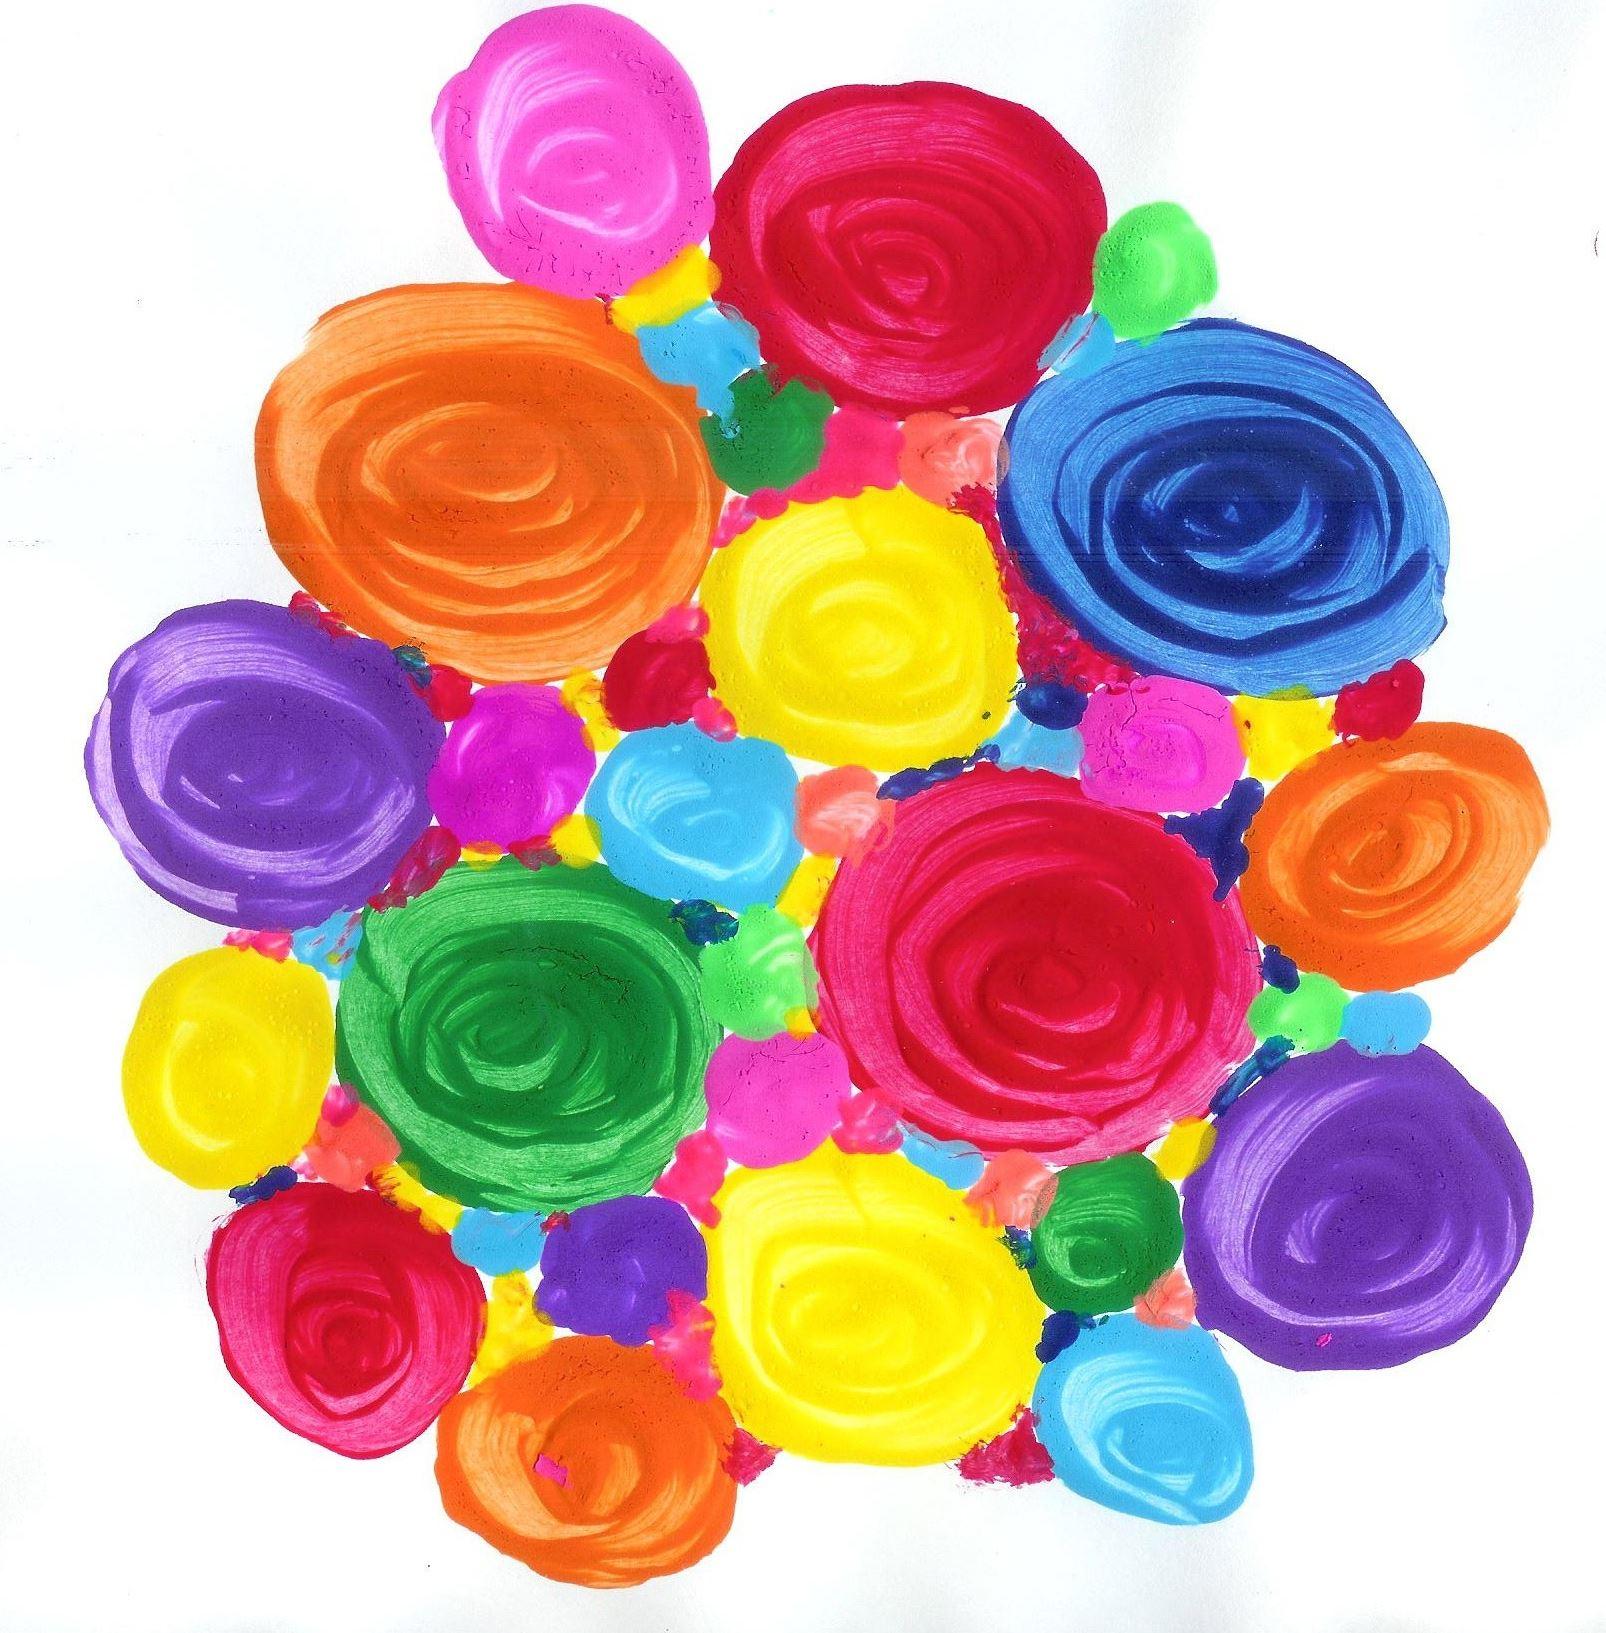 [Image Description: Dozens of bright swirled circles mass together into a single amorphous shape.]